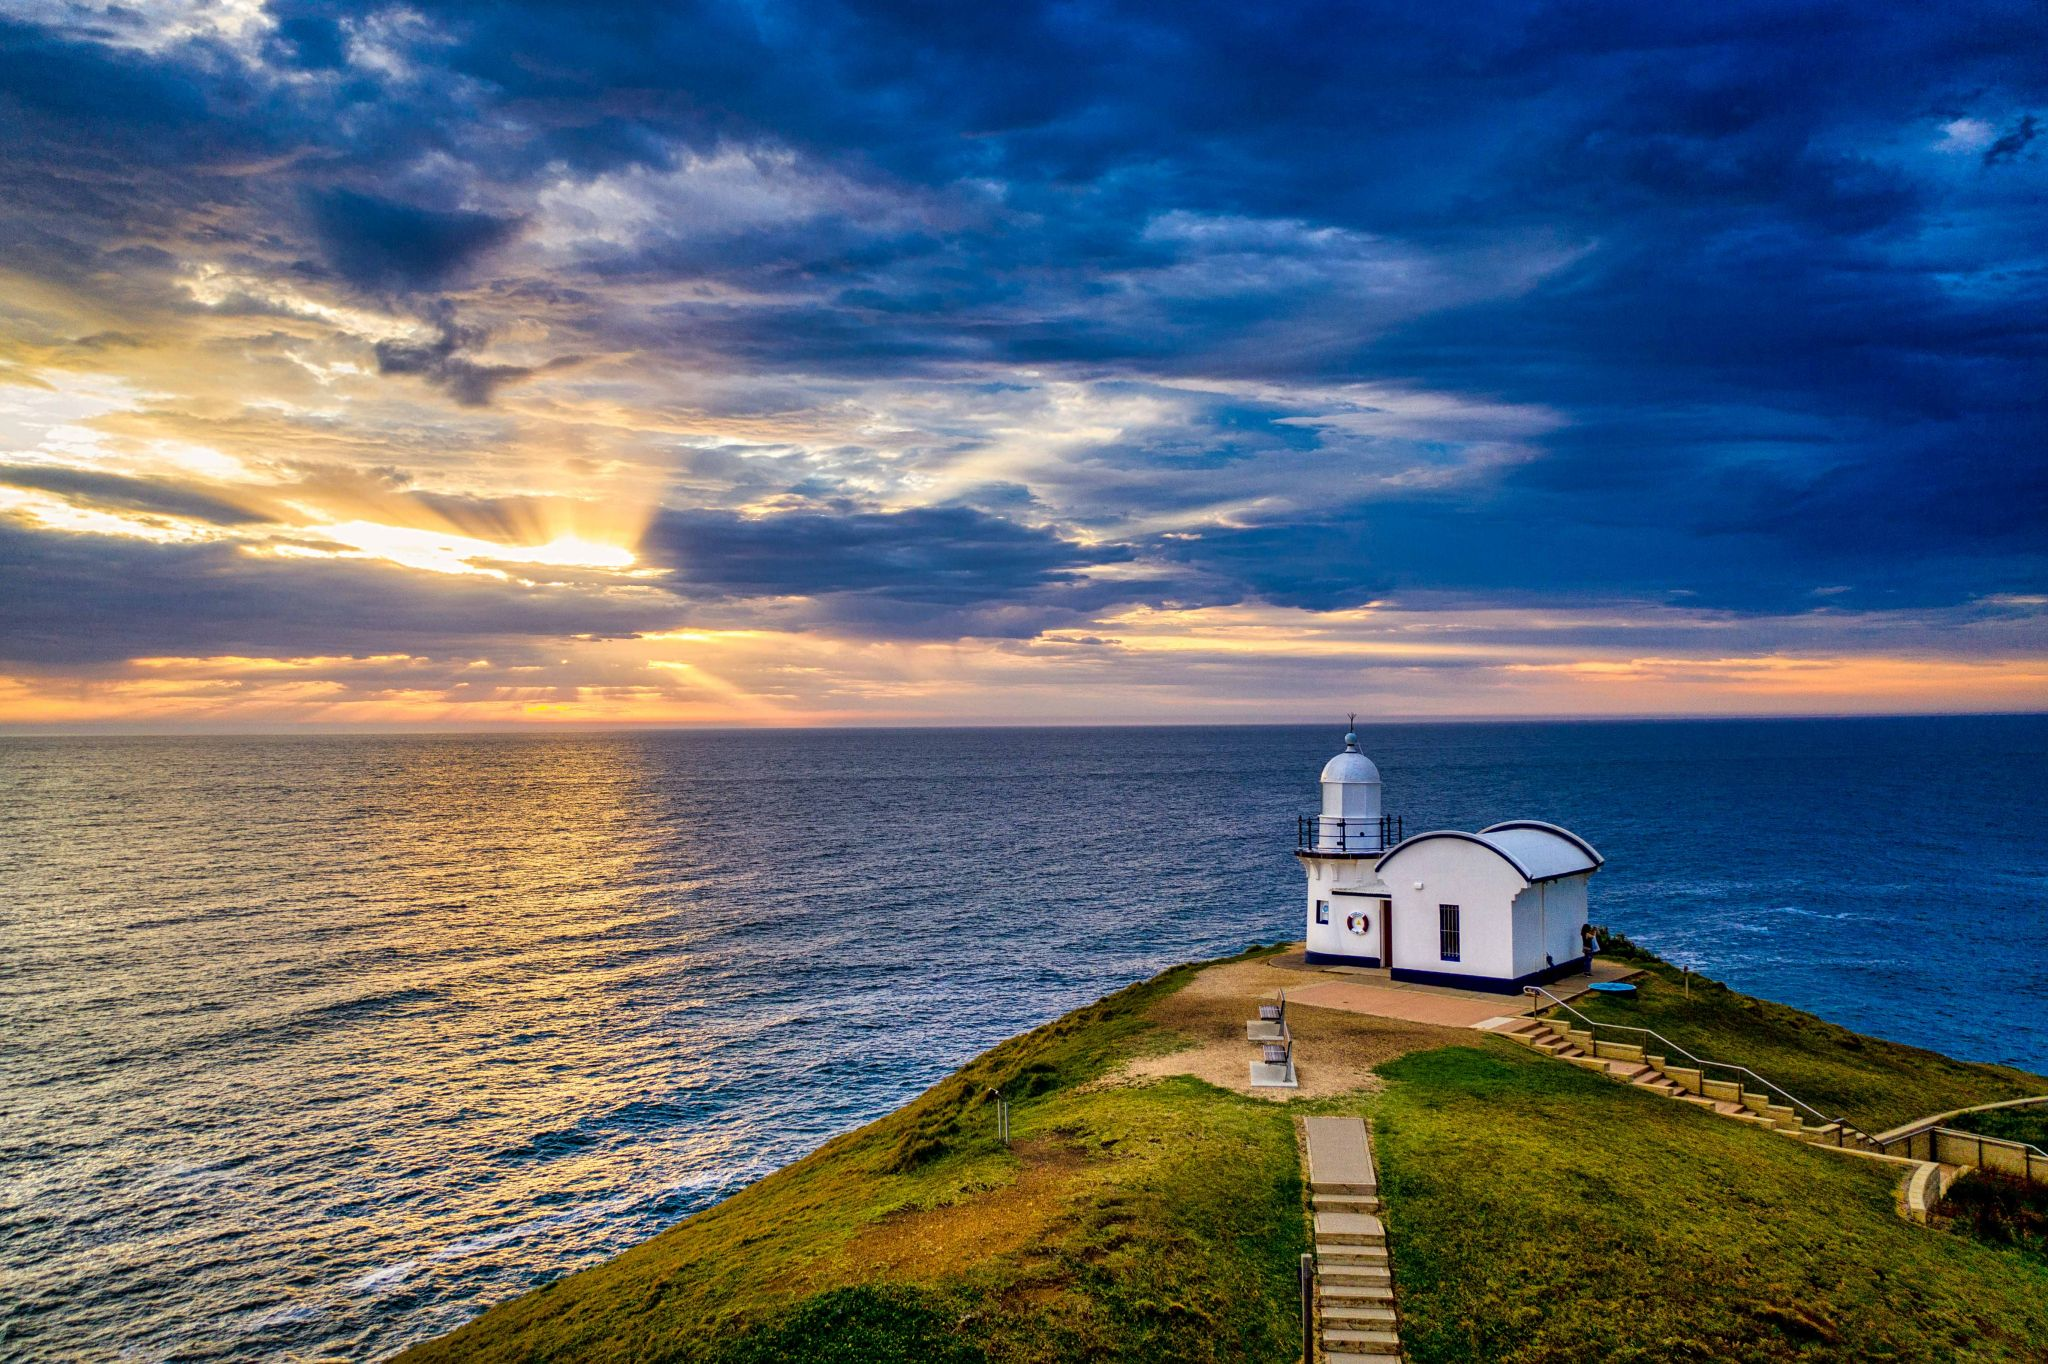 Drone sunrise Taking Point Lighthouse Port Macquarie NSW, Australia